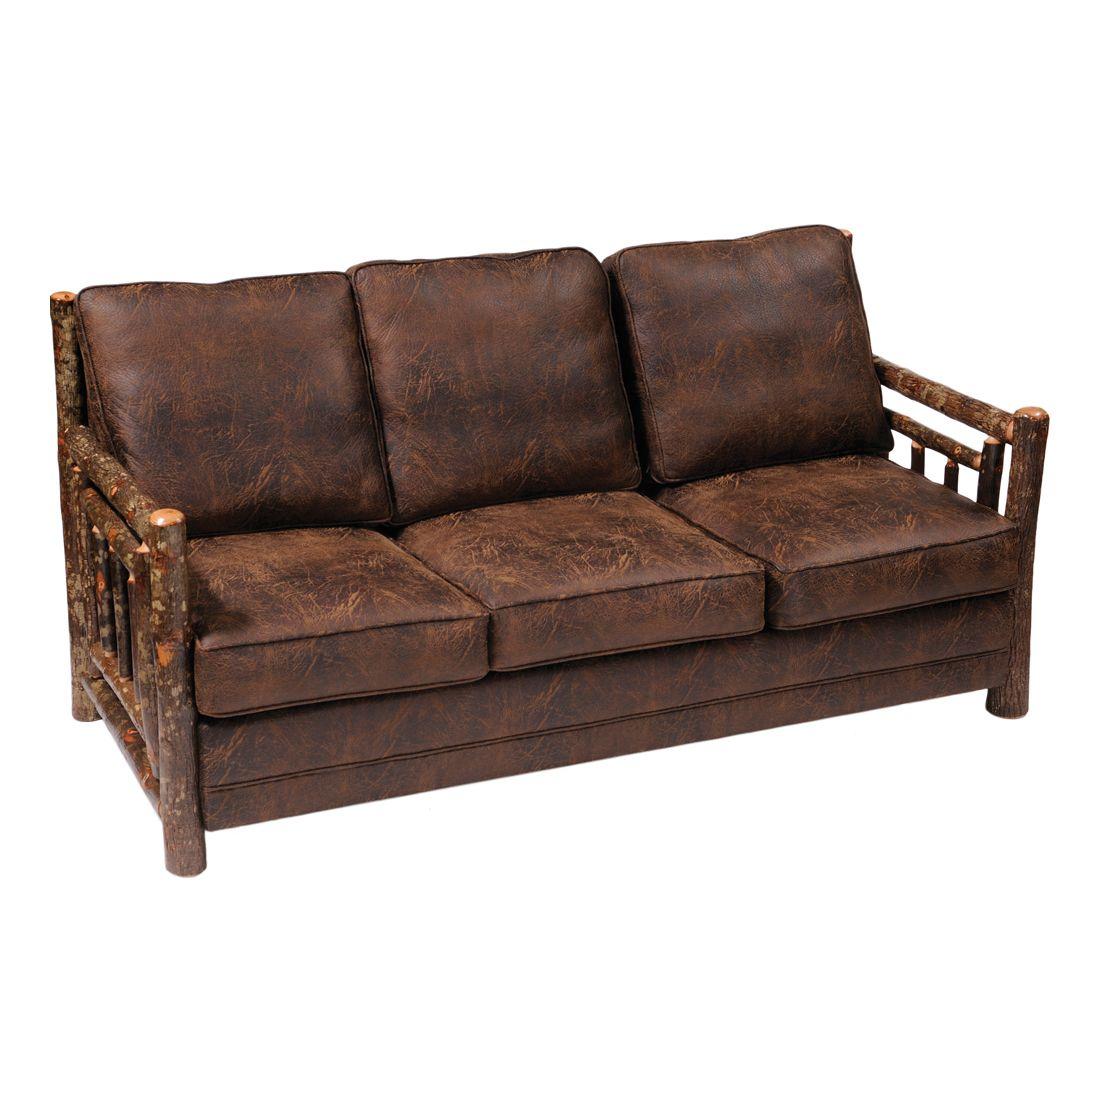 Hickory Sleeper Sofa Bed Lodge Furniture Cabin Decor Sleeper Sofa